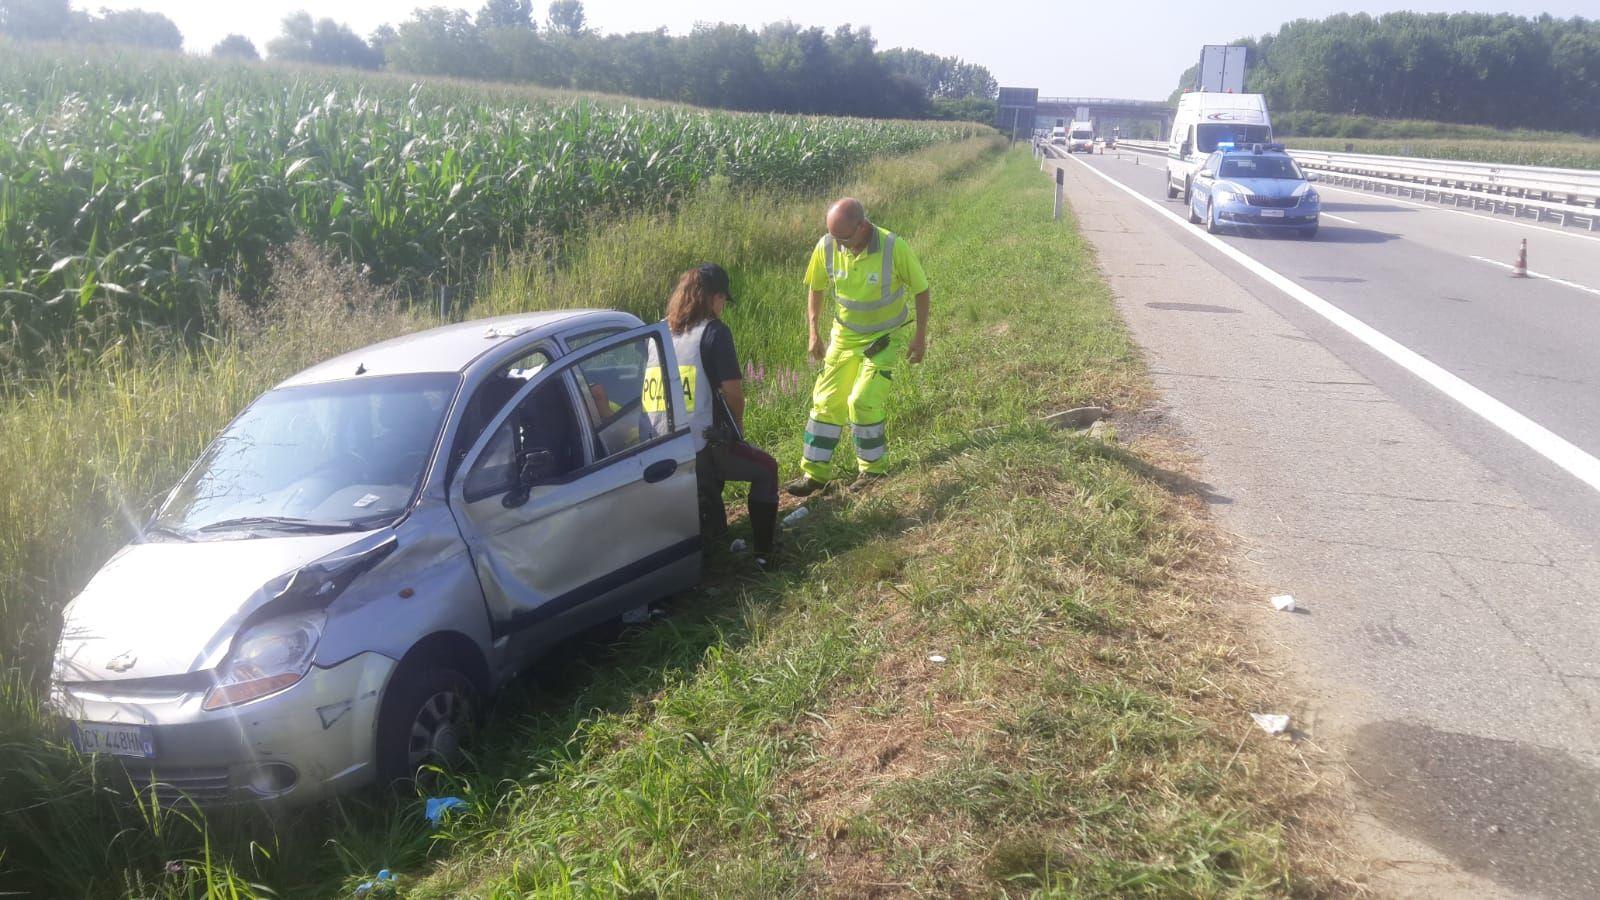 PAVONE CANAVESE - Incidente in autostrada: donna ferita - FOTO